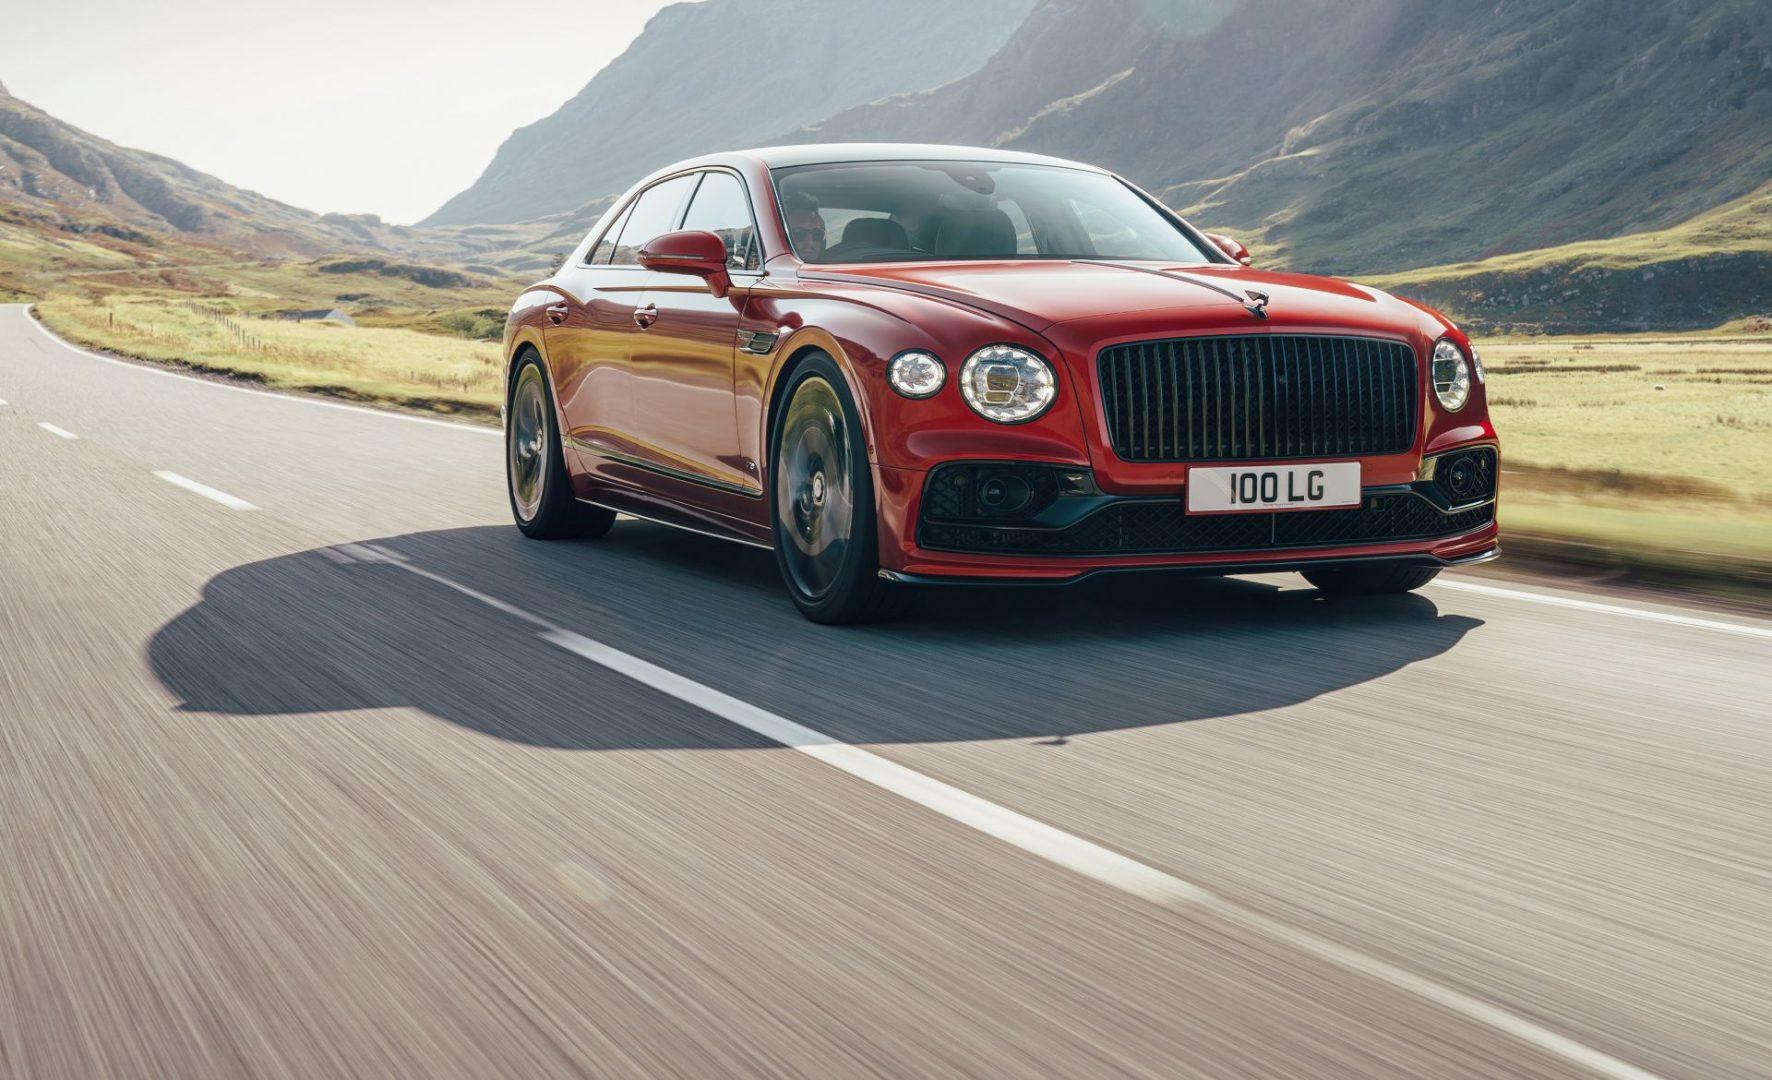 Bentley Flying Spur od sada dostupan i s manjim V8 motorom